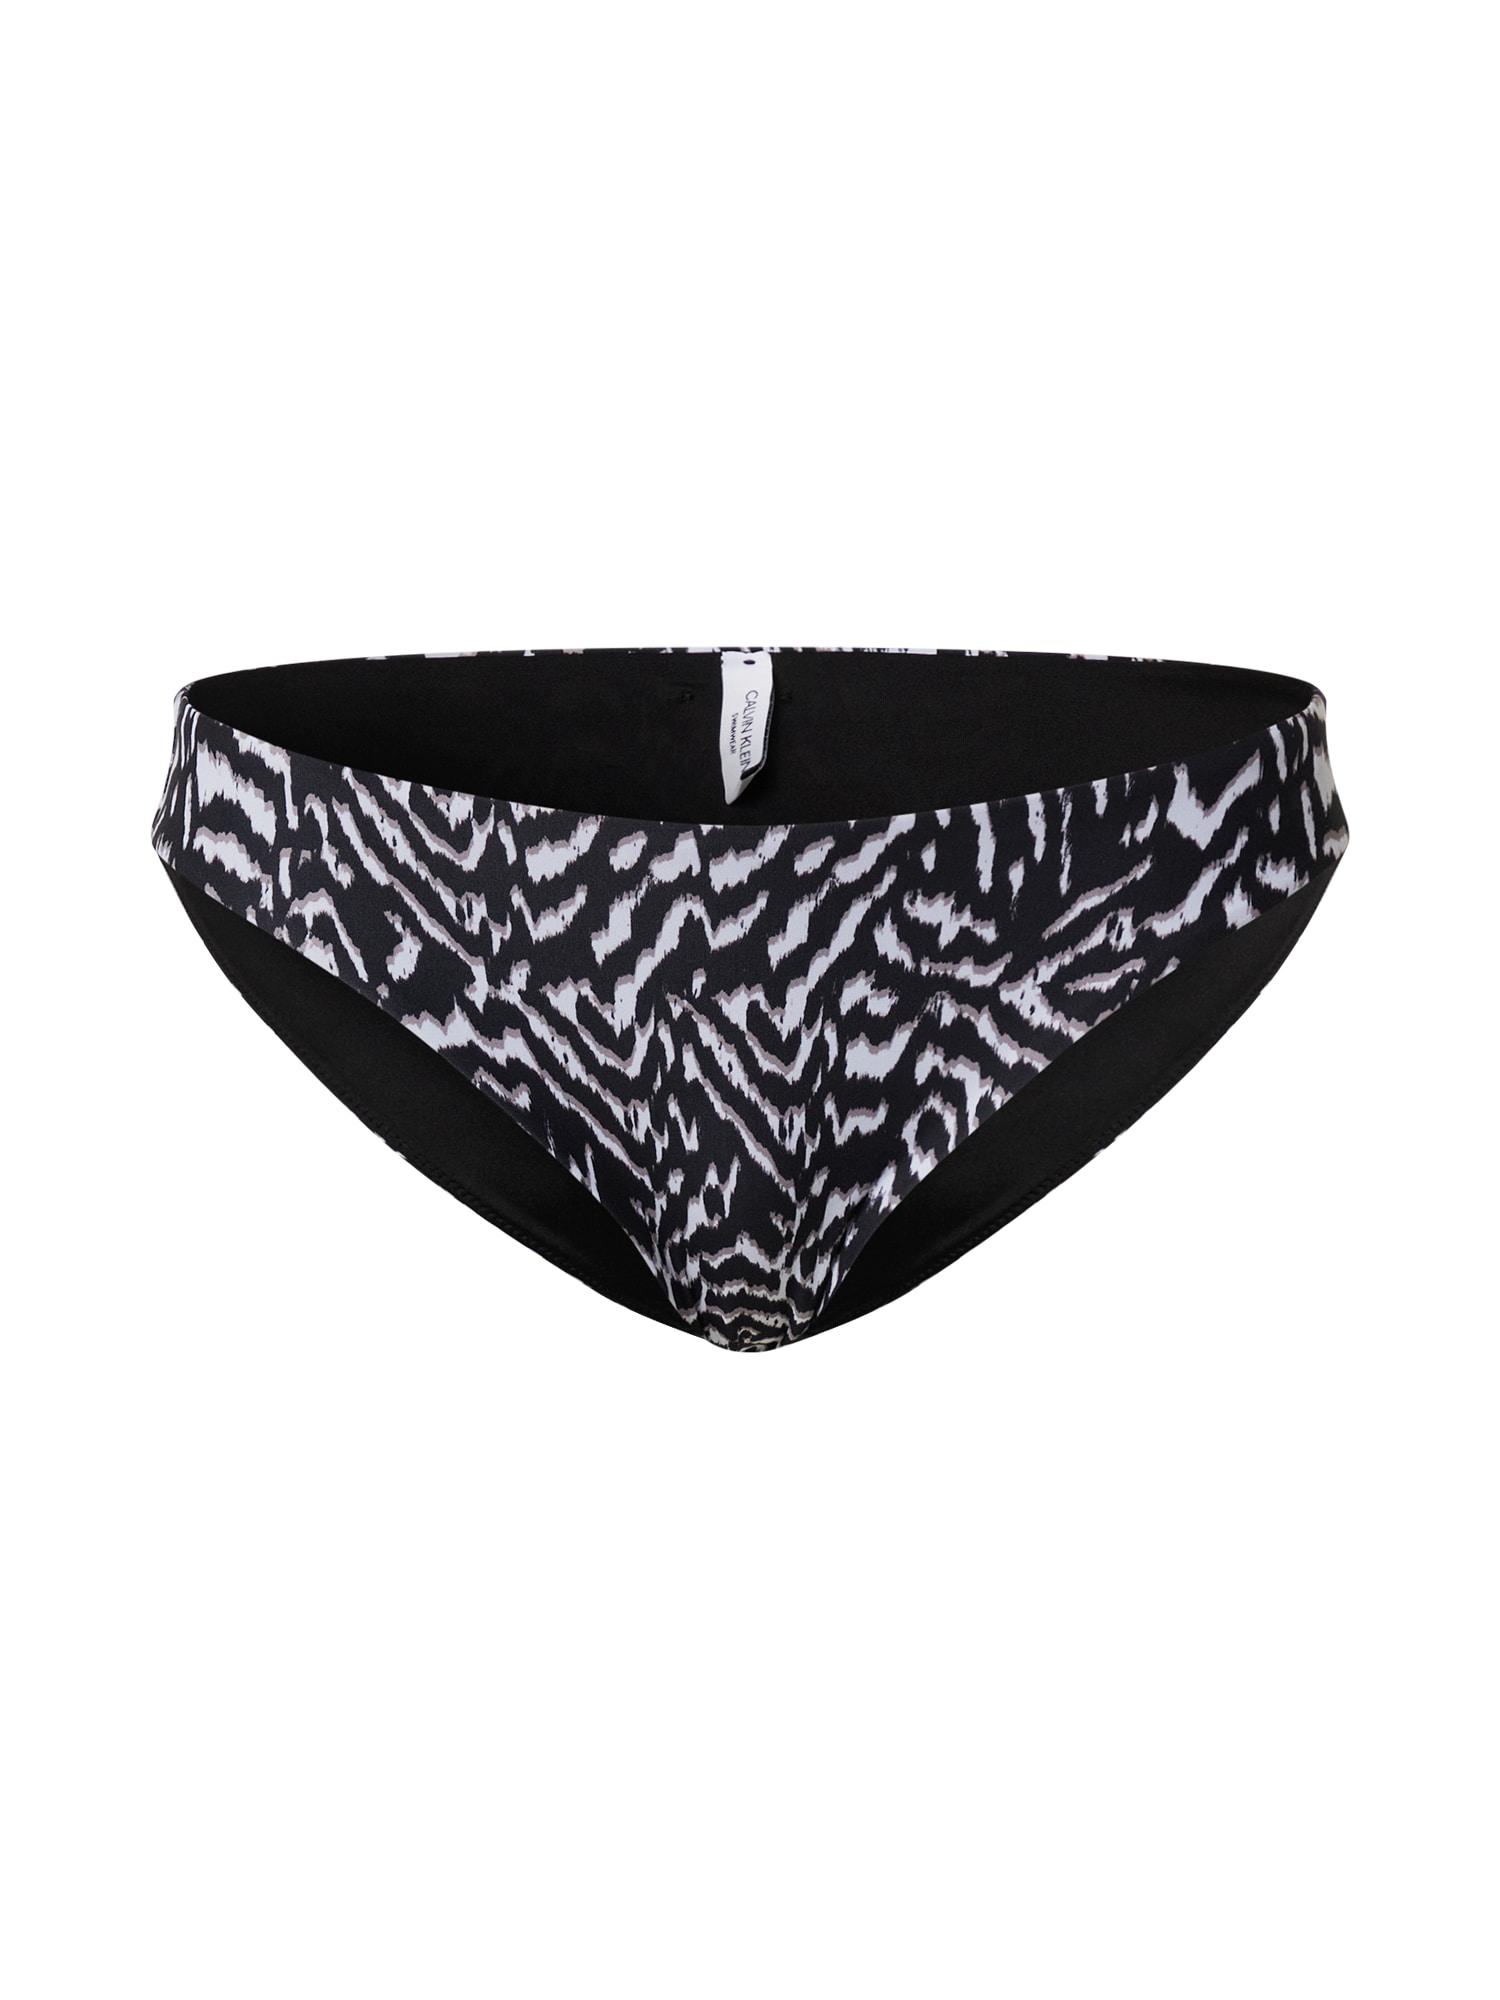 Calvin Klein Swimwear Spodní díl plavek  černá / bílá / režná